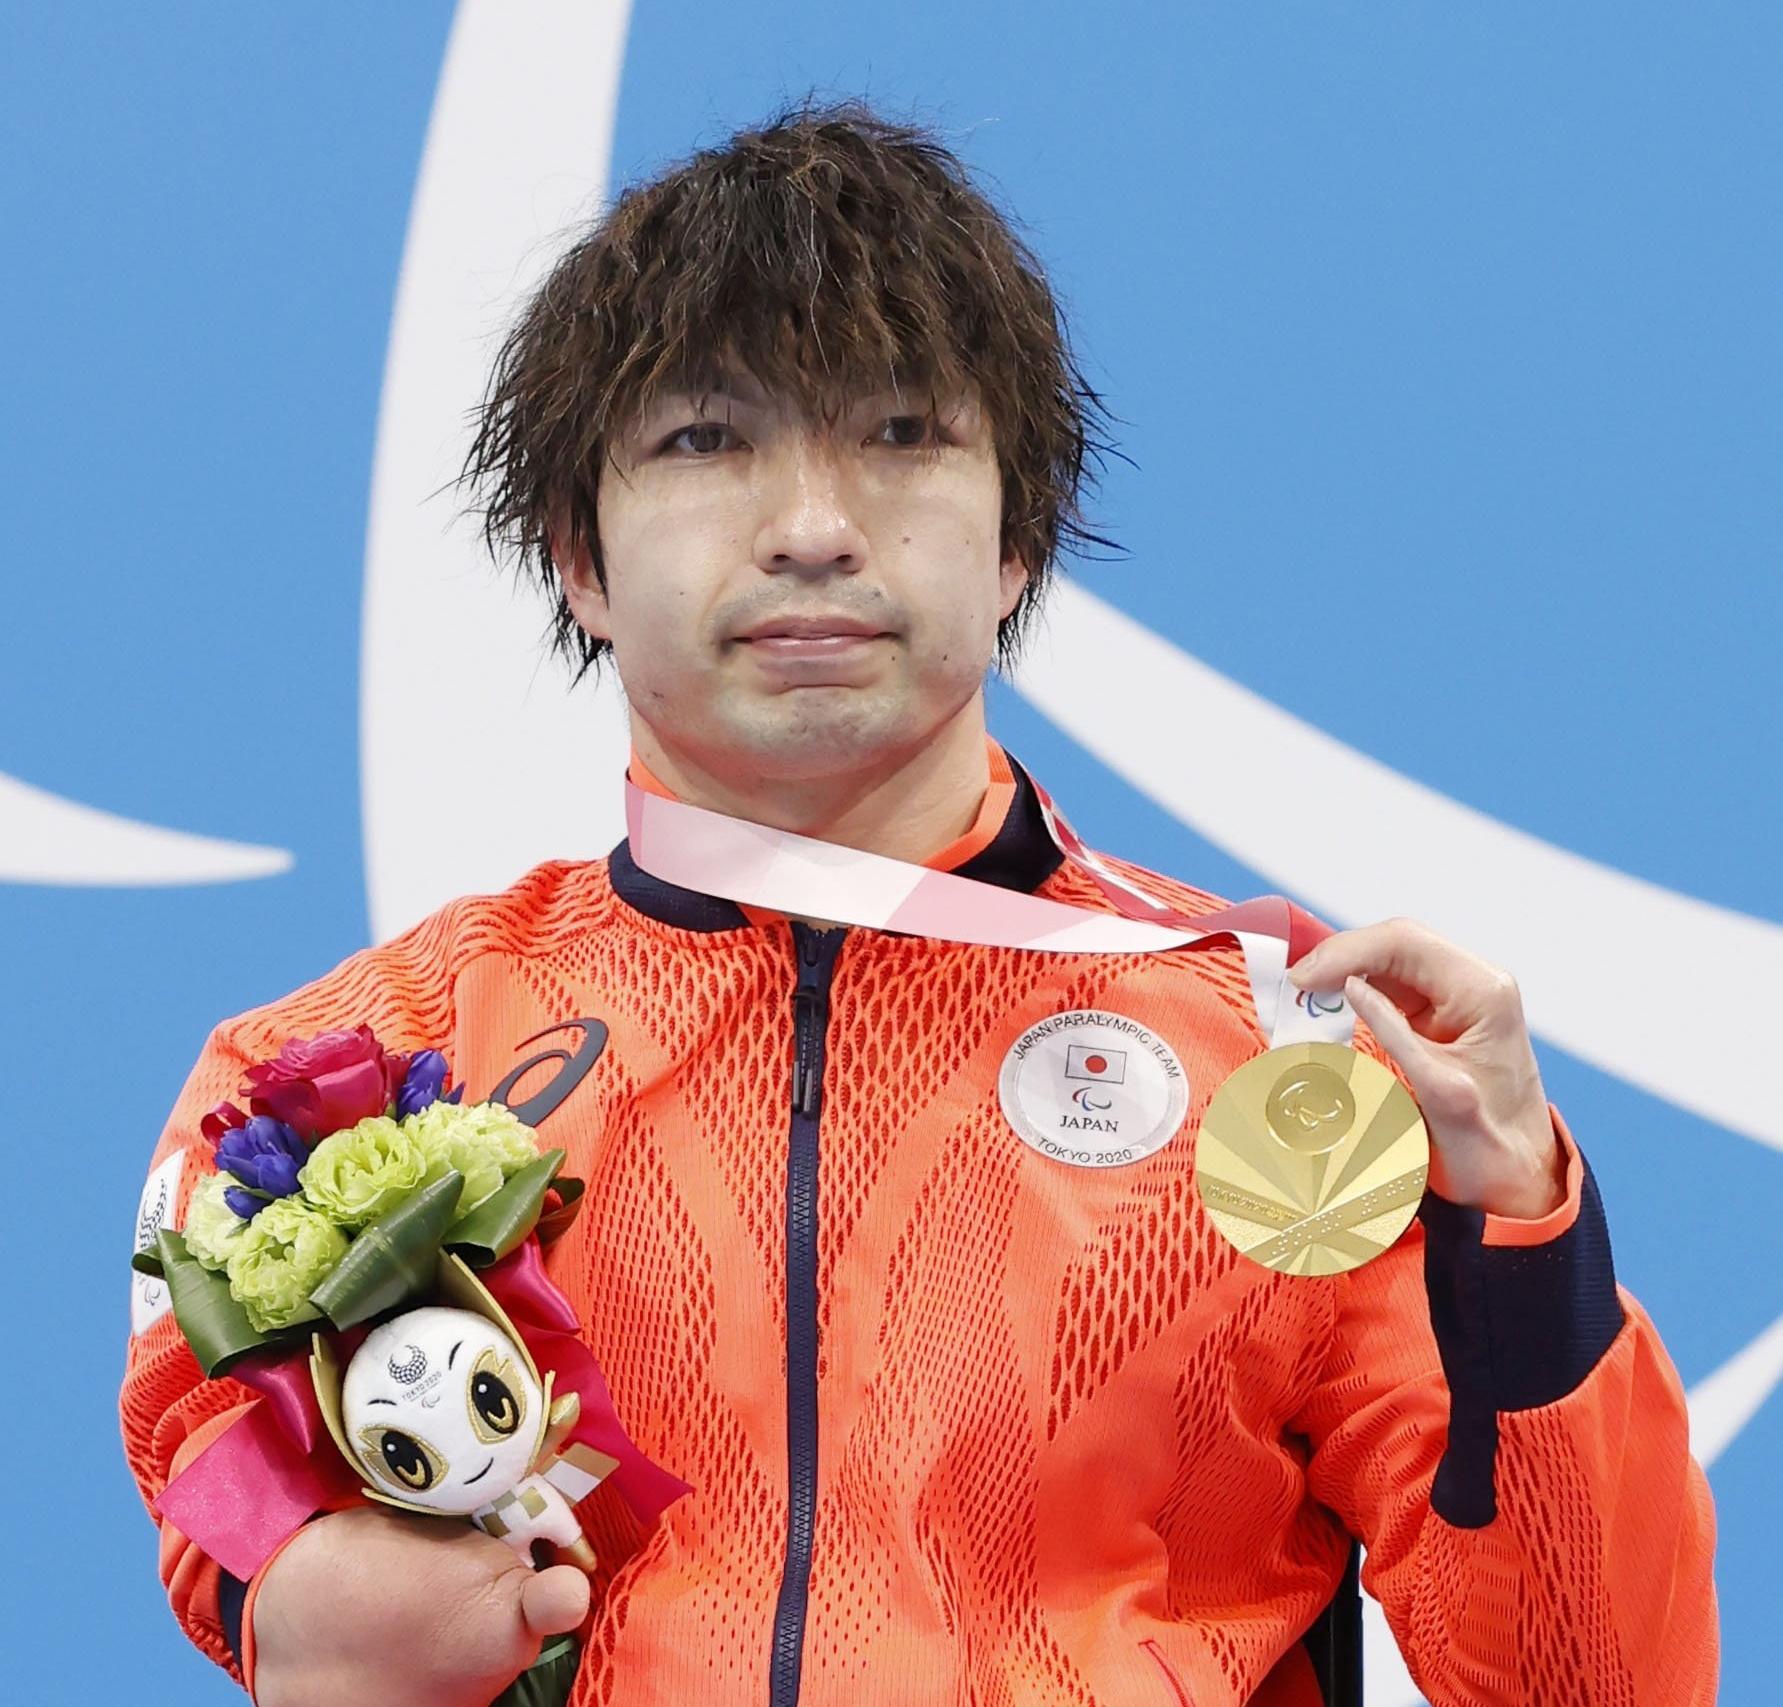 Alumni Takayuki Suzuki wins gold in 100m freestyle at Tokyo 2020 Paralympic Games!